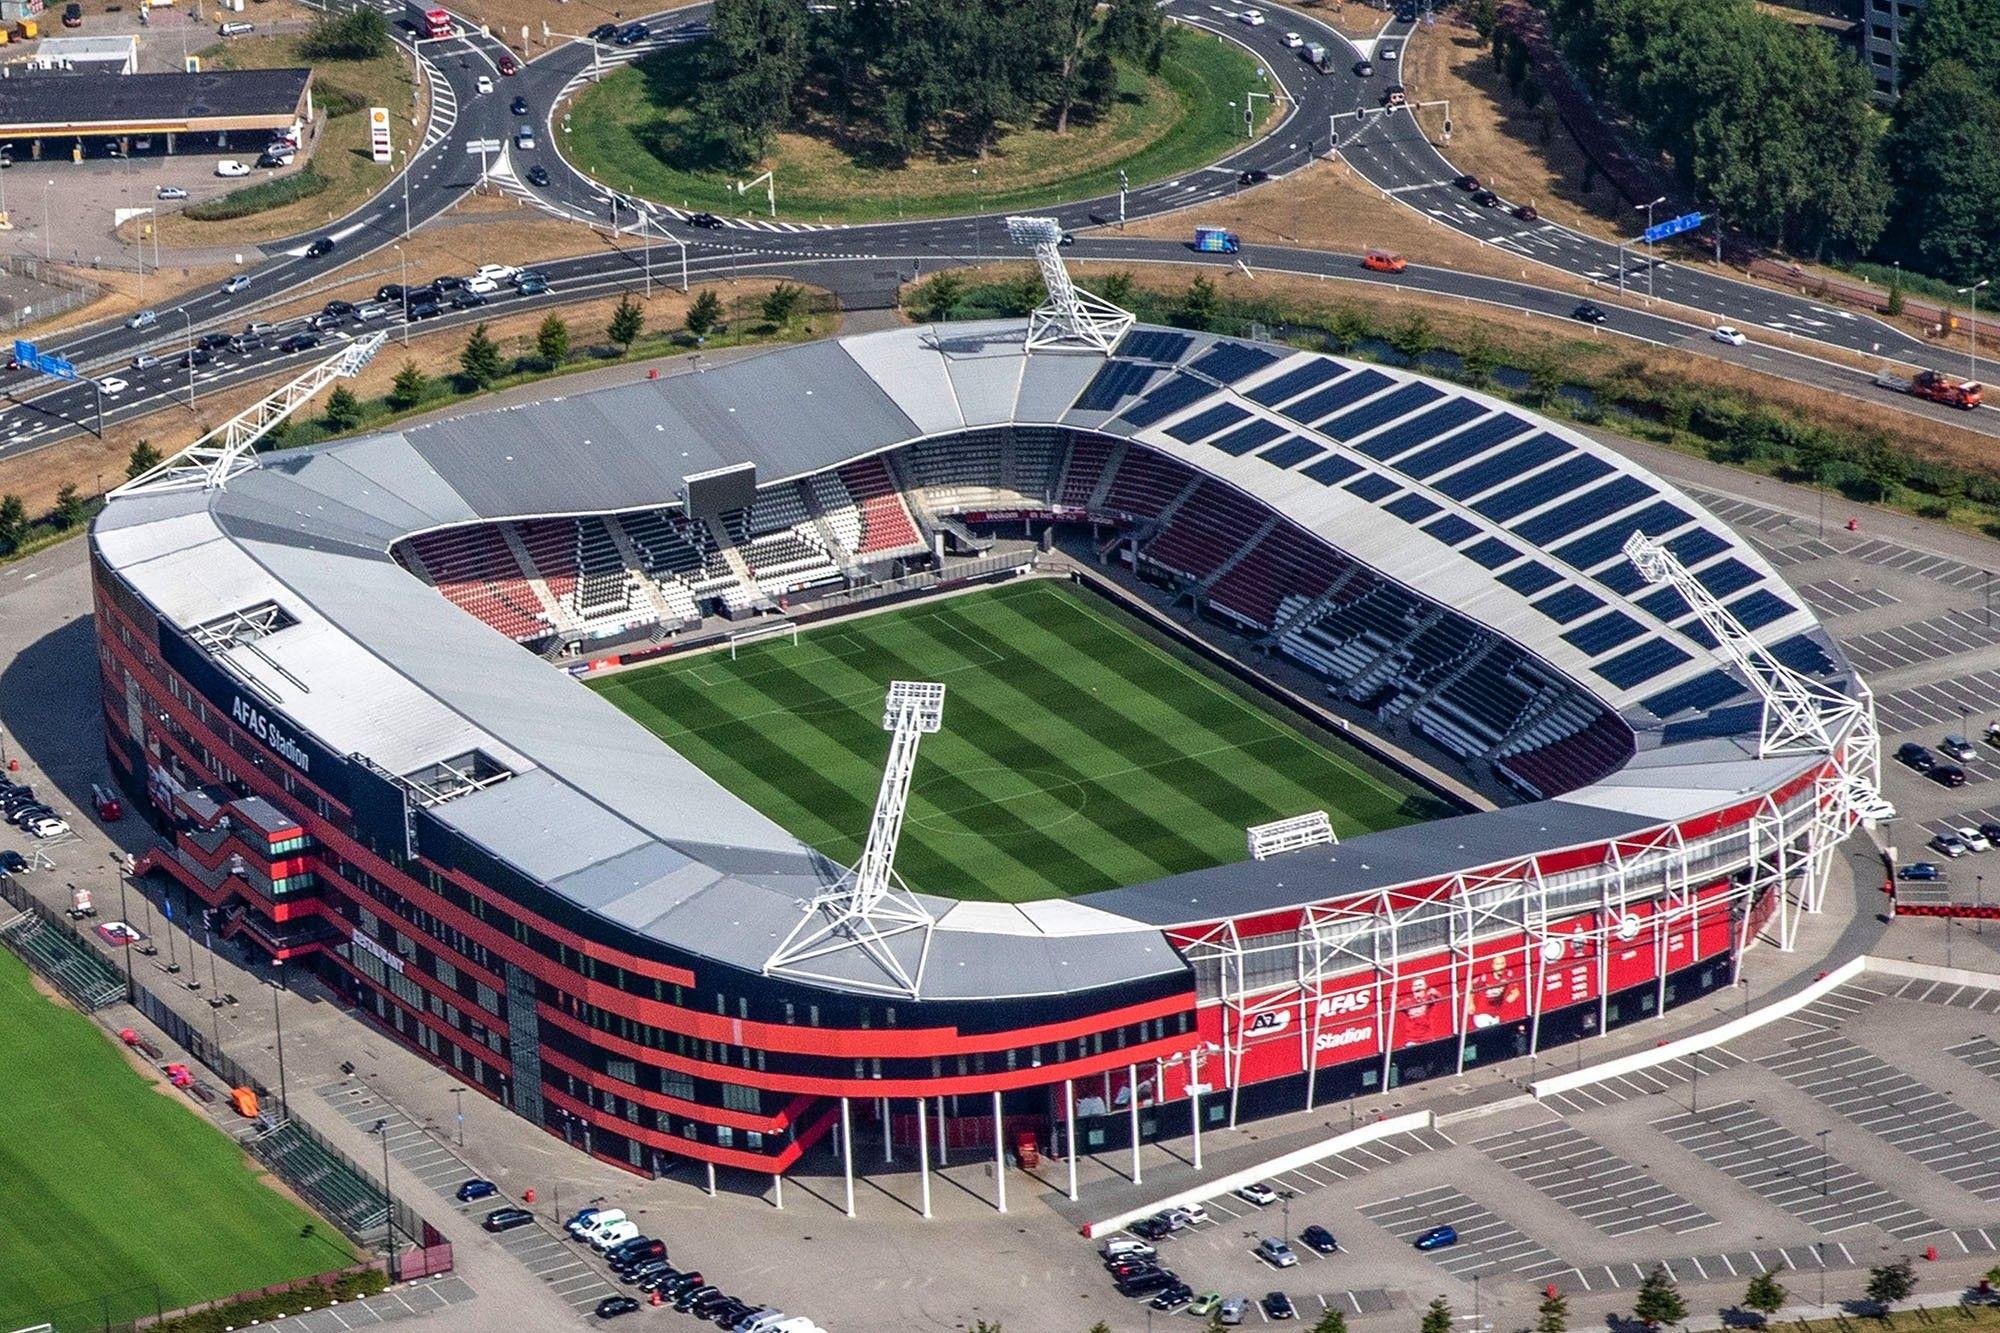 Az Afas Stadion Arsitektur